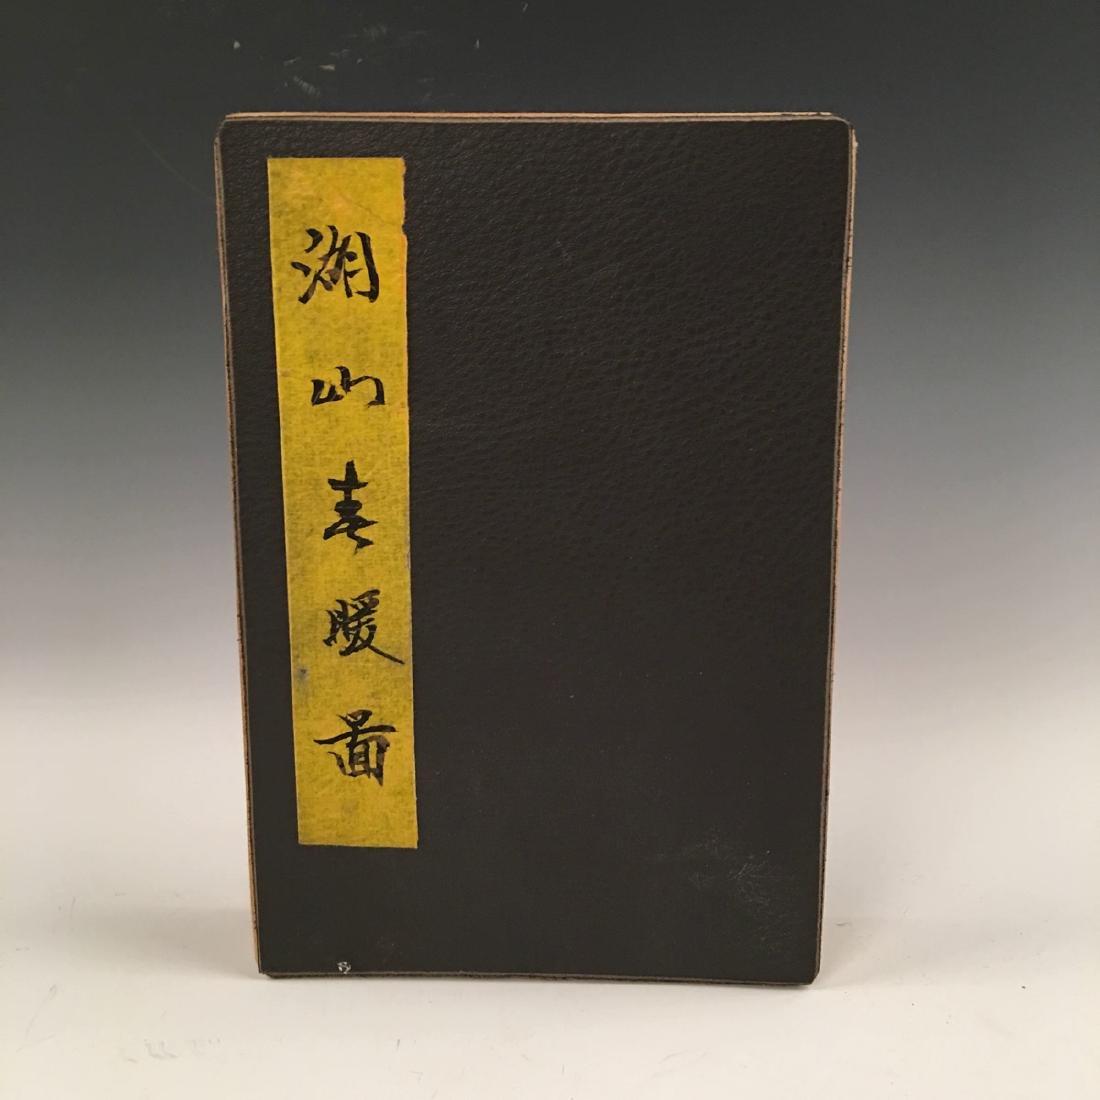 Chinese Folded Painting Album Of Hu Shan Chun Nan Tu